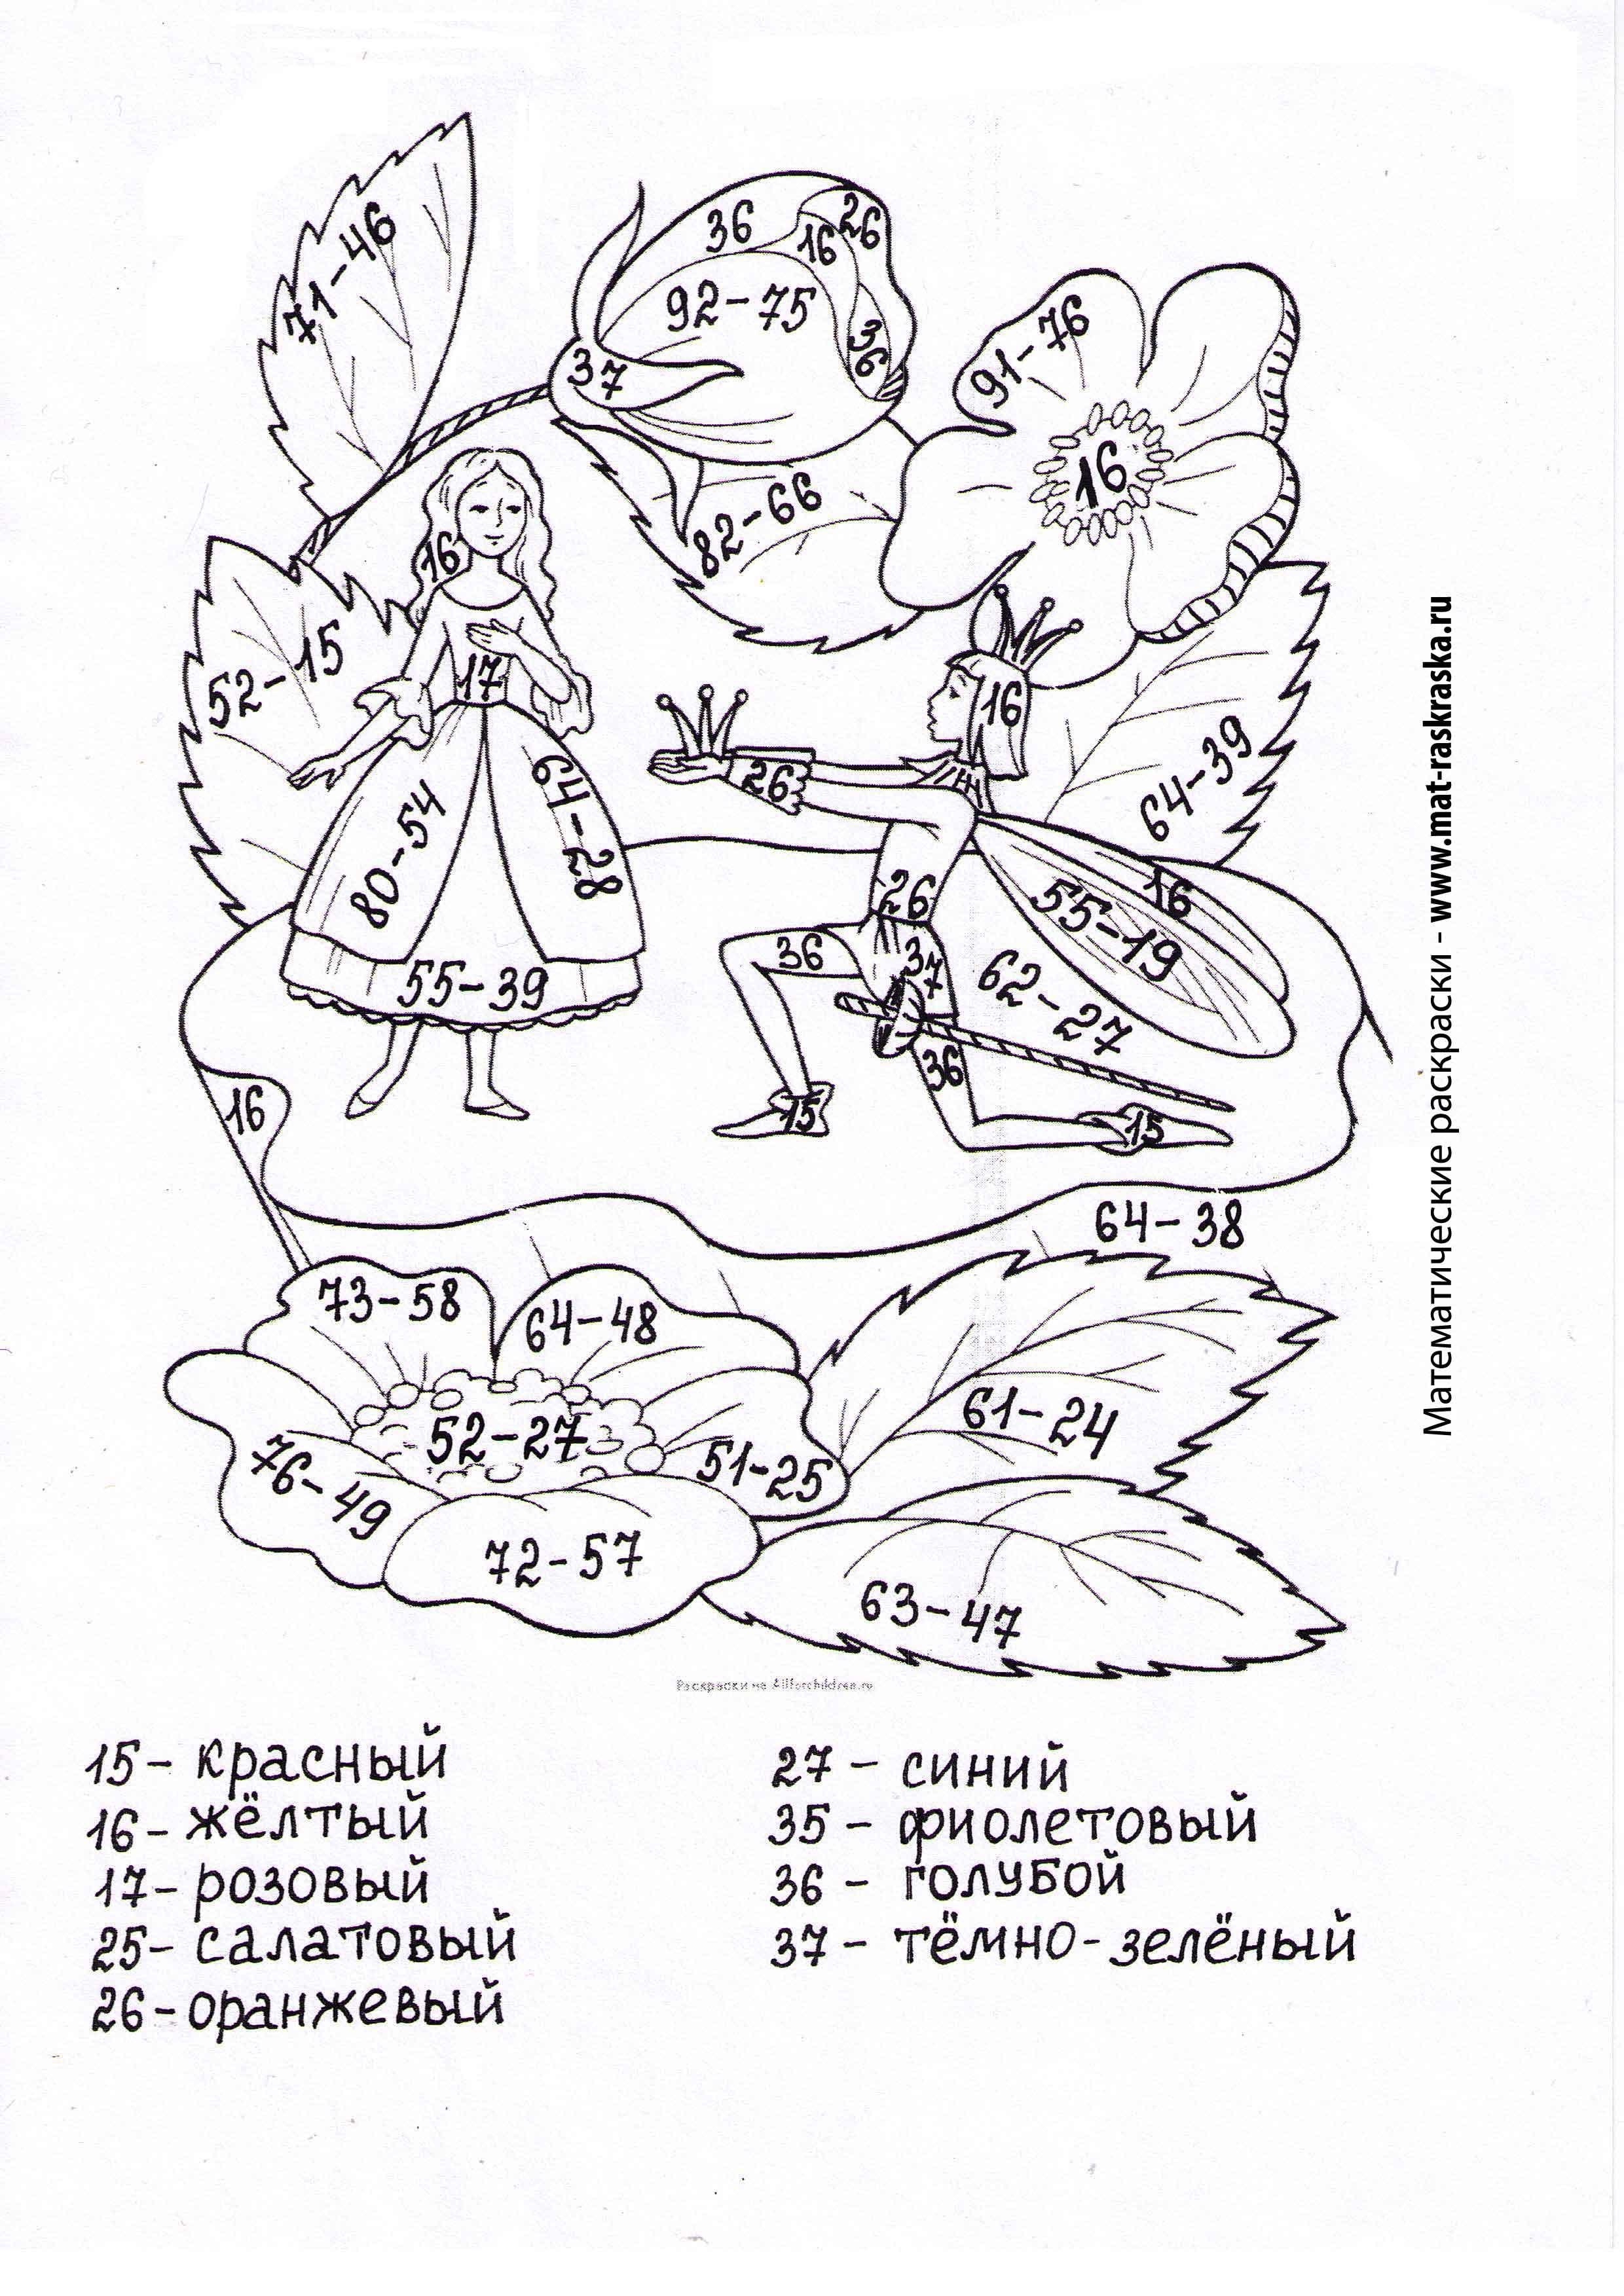 duimovoch-i-elf-vichit-2zn-s-pereh10-ras2_big